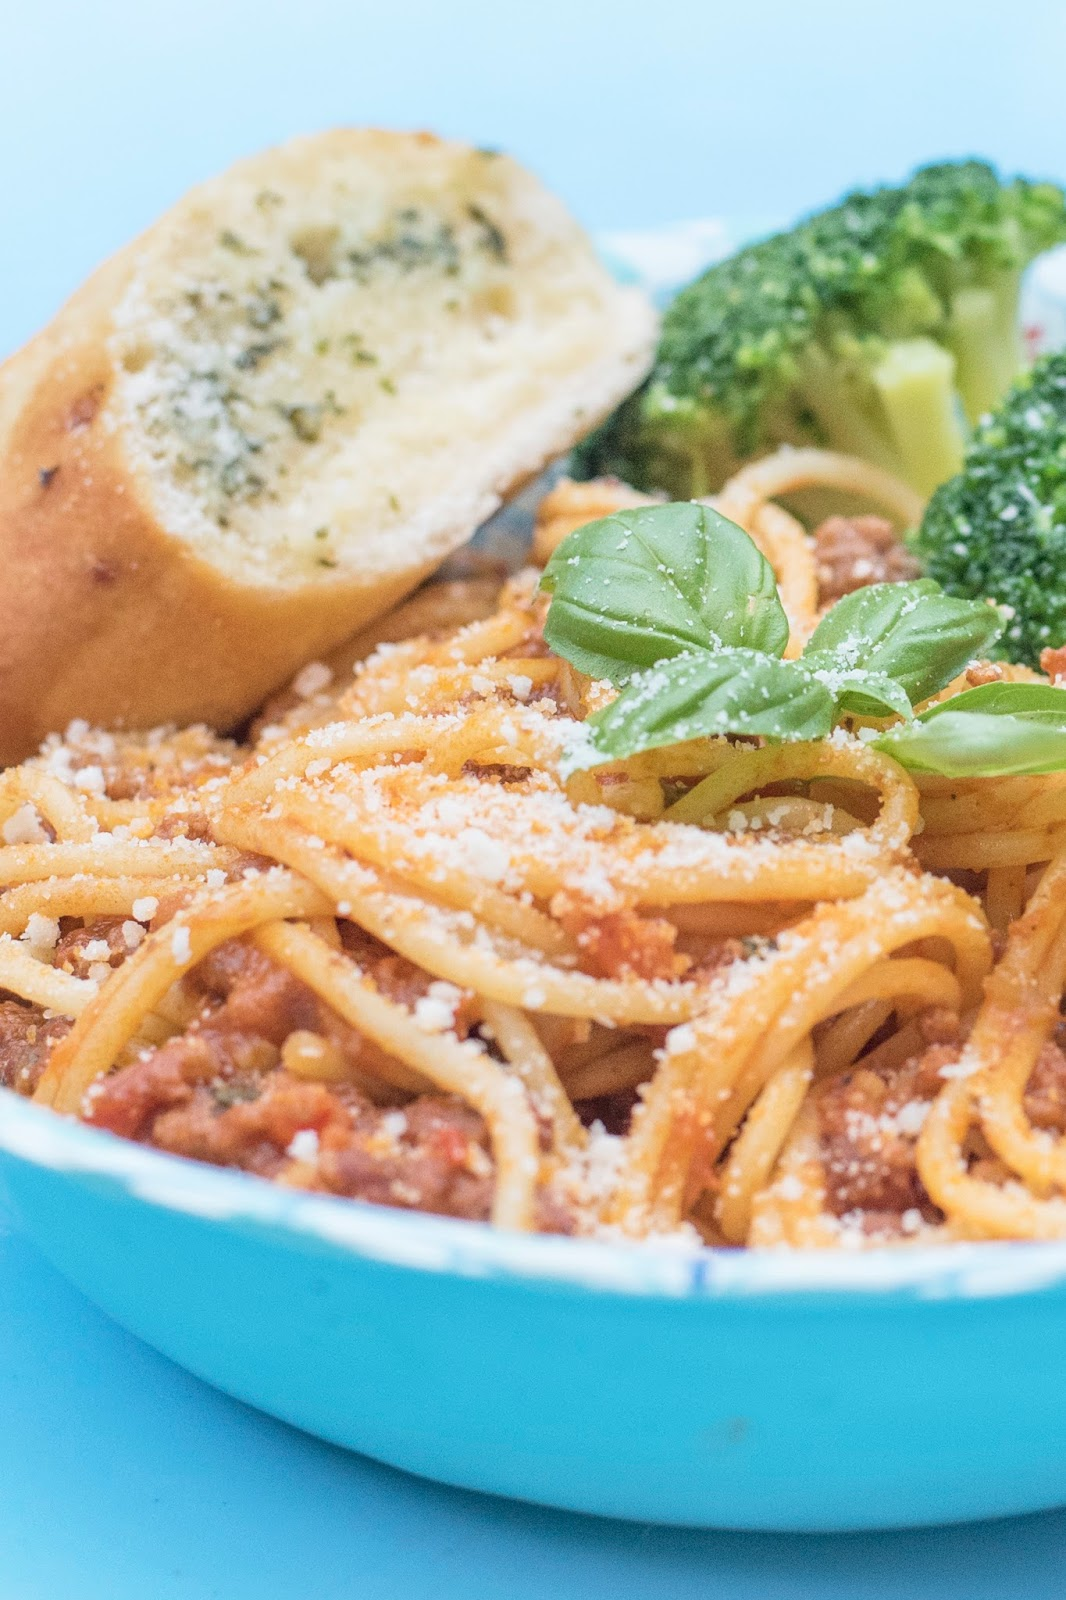 Charlie Bighams Spaghetti Bolognese Meal